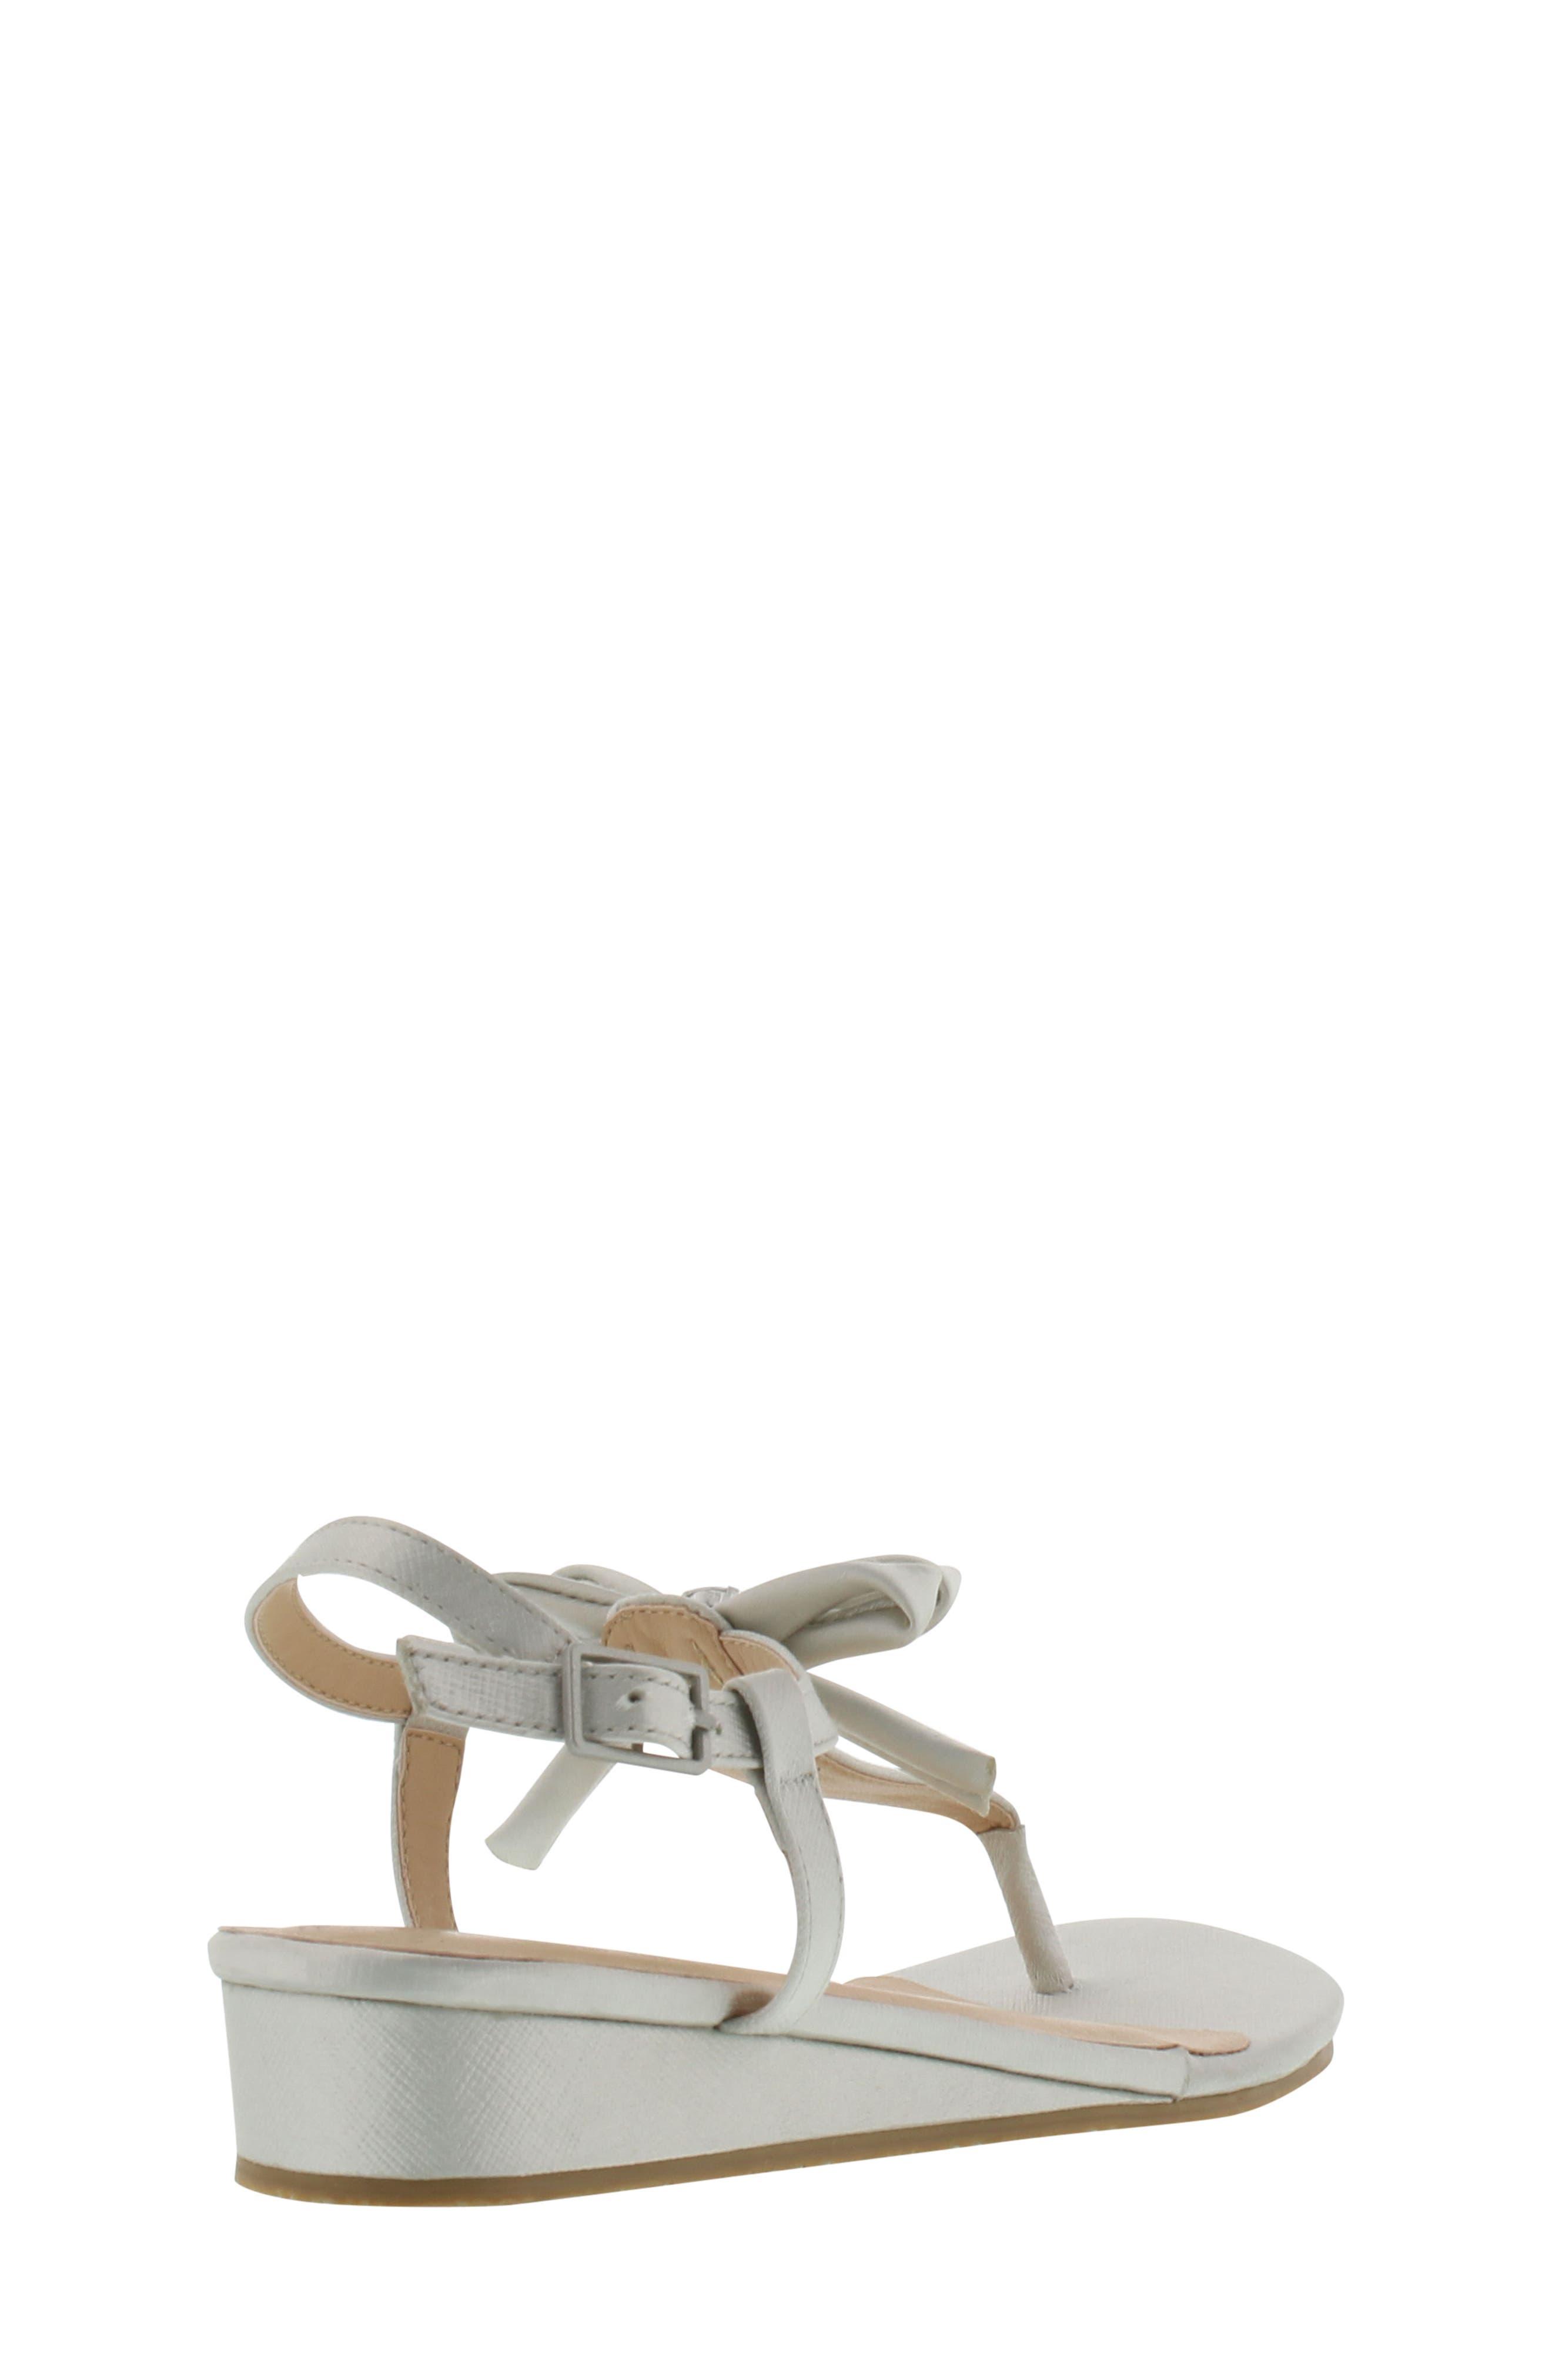 Talia Embellished Bow Sandal,                             Alternate thumbnail 2, color,                             Silver